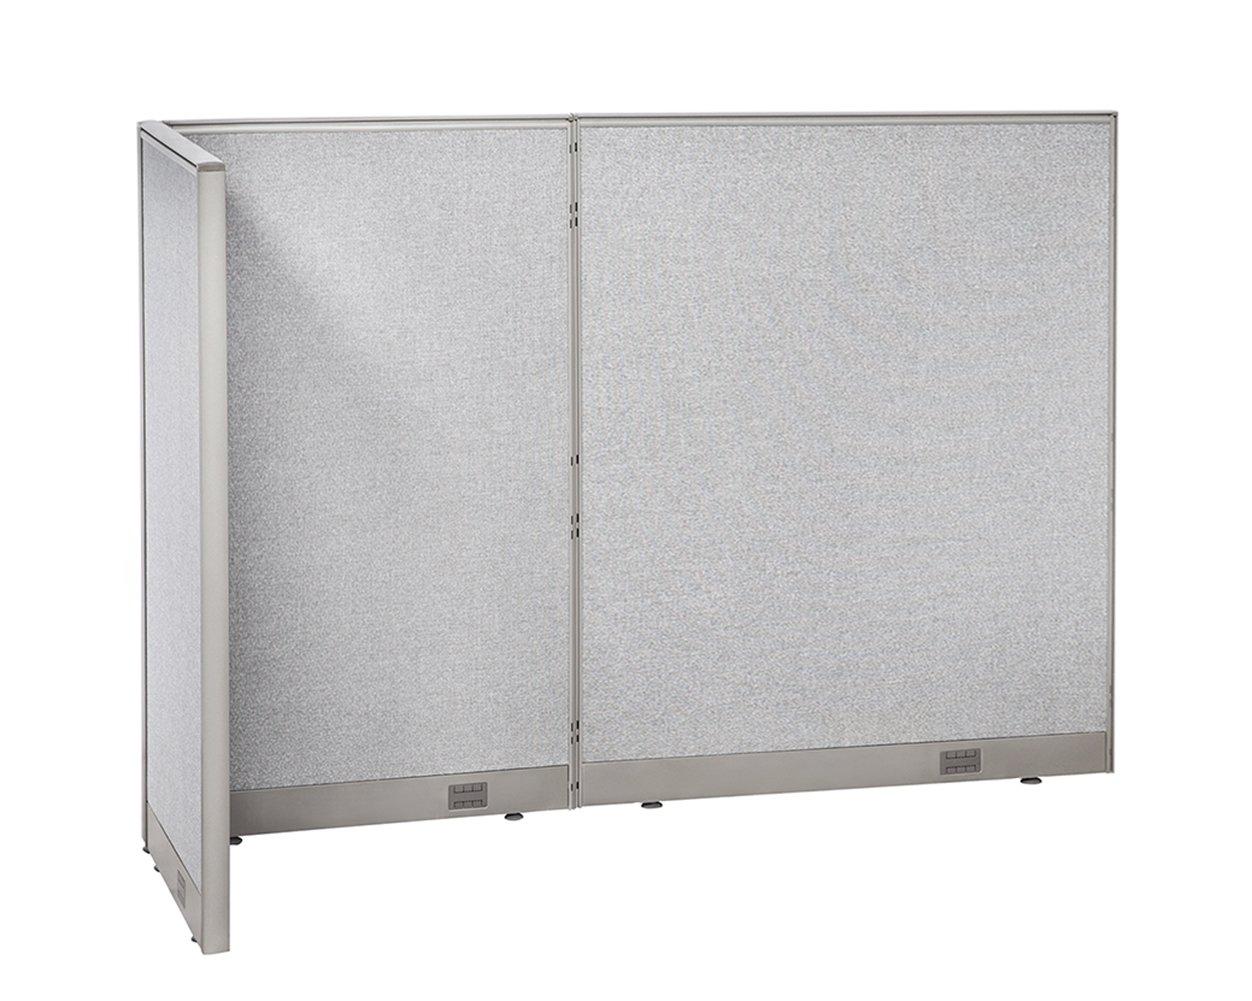 GOF L-Shaped Freestanding Partition 30D x 84W x 60H / Office, Room Divider 2.5' x 7' (30D x 84W x 60H)